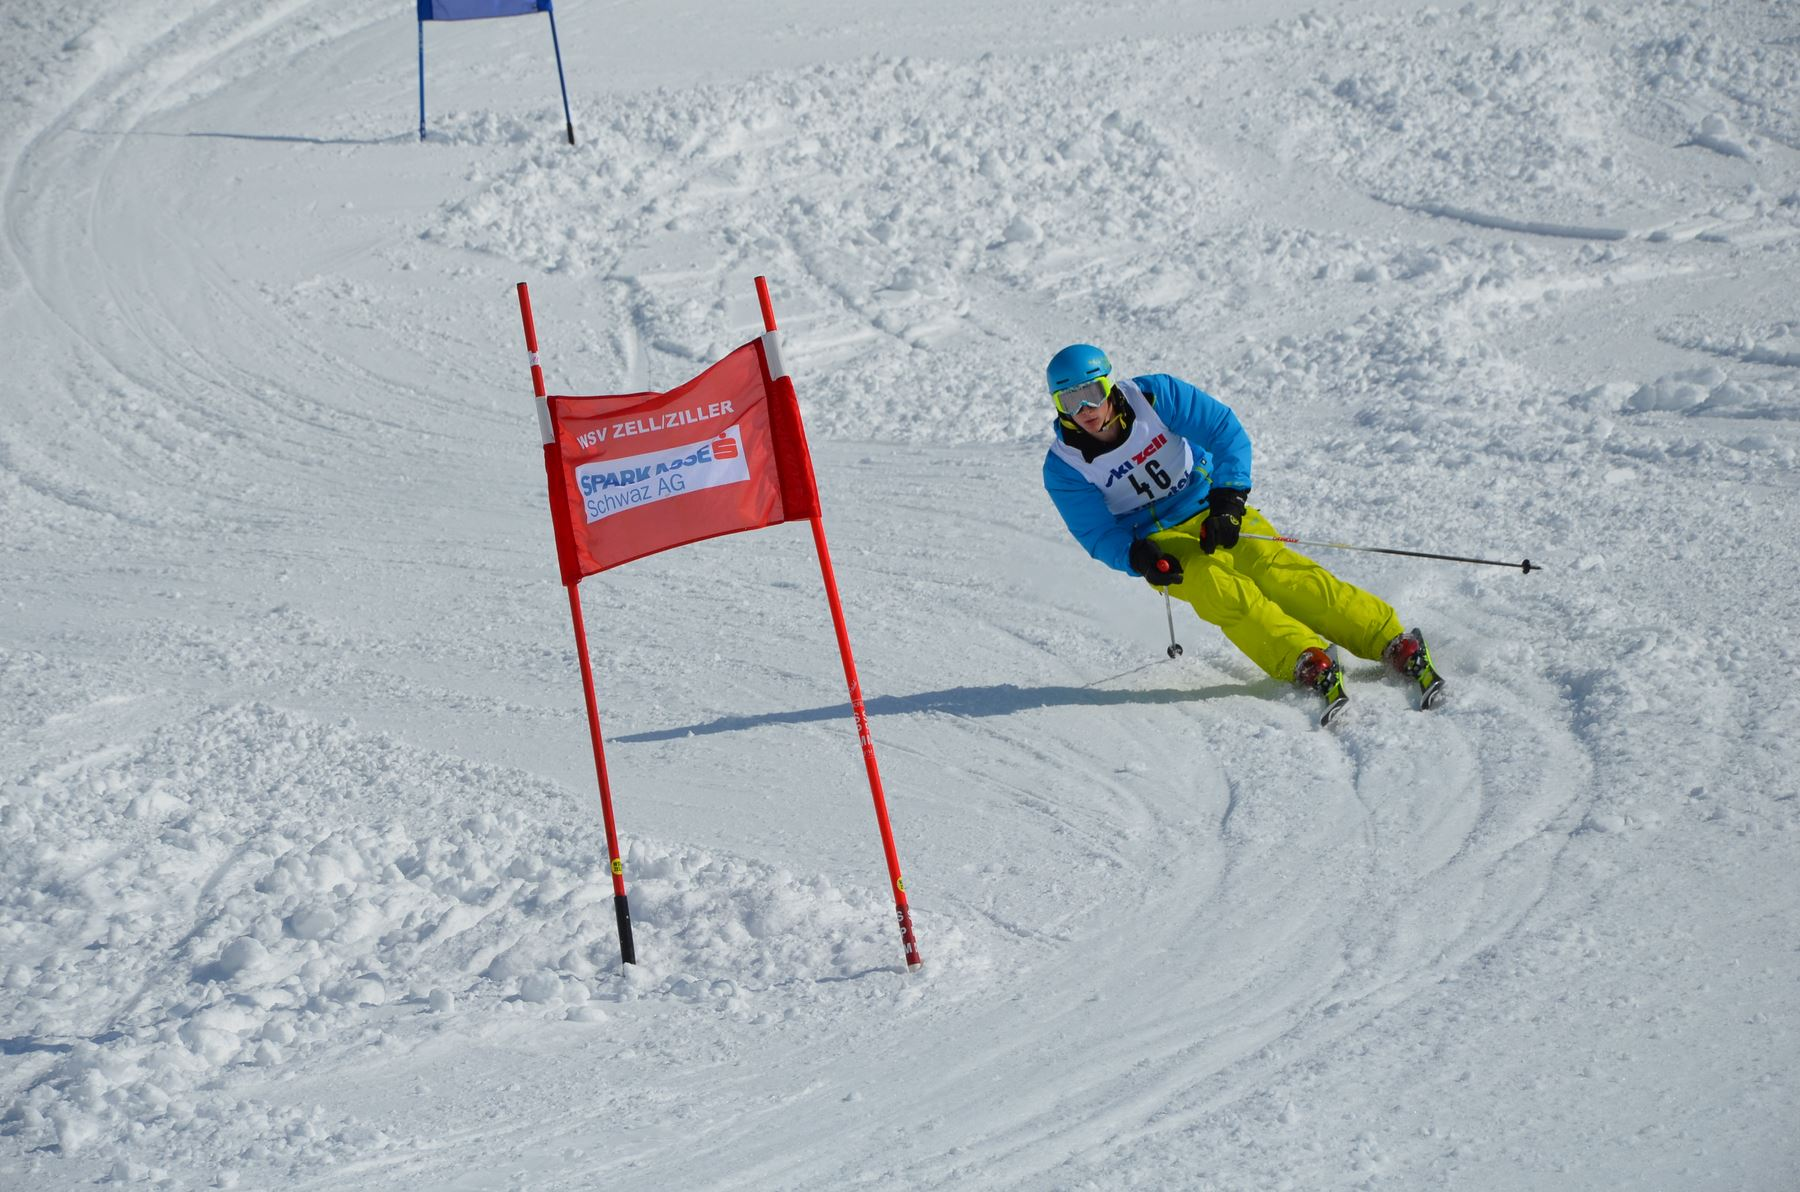 2015-03-22 BV Zillertal Skirennen 156.JPG